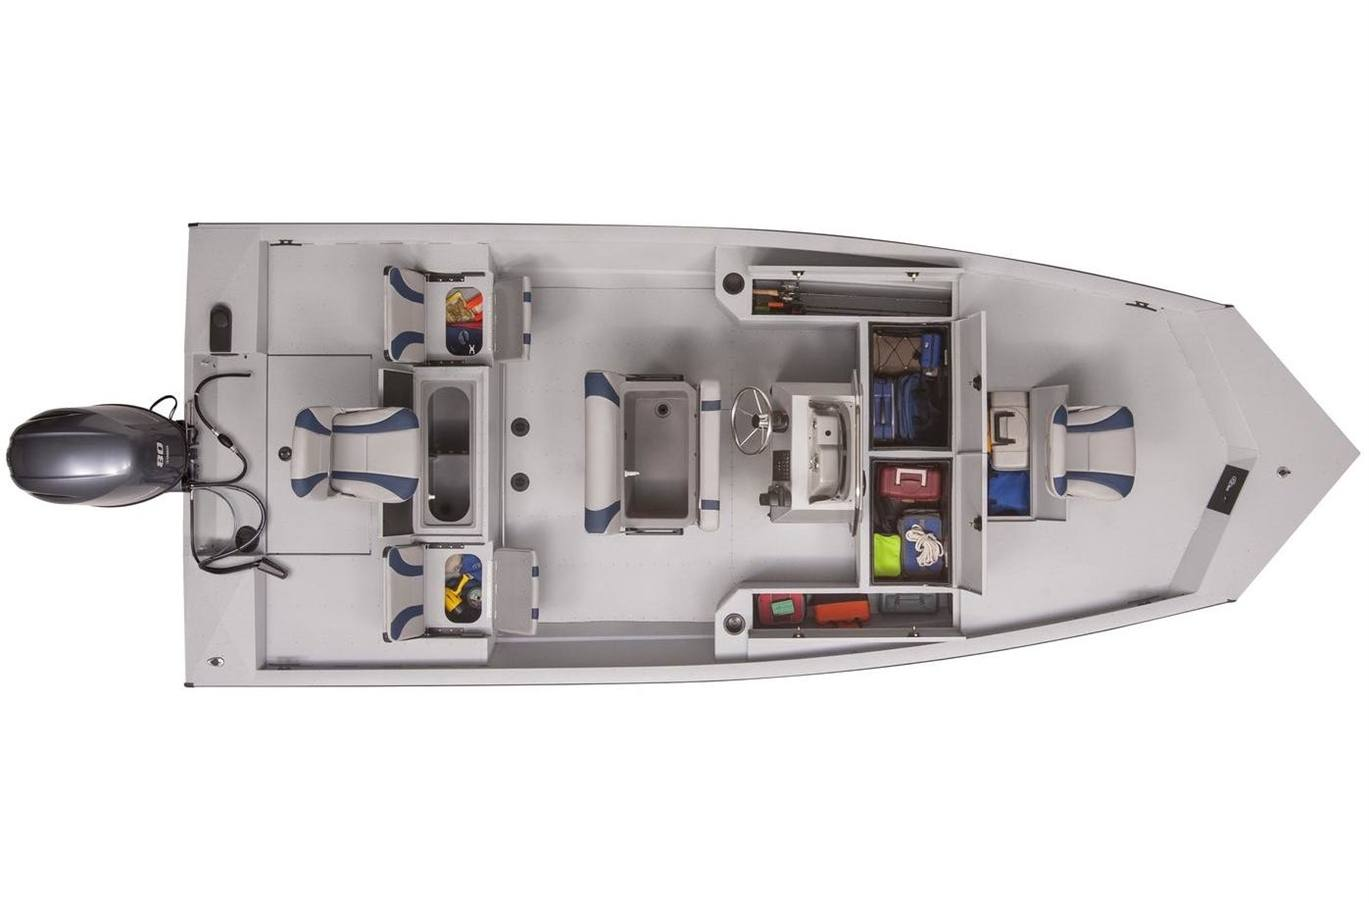 2020 g3 gator tough 20 ccj dlx (jet hull tunnel)